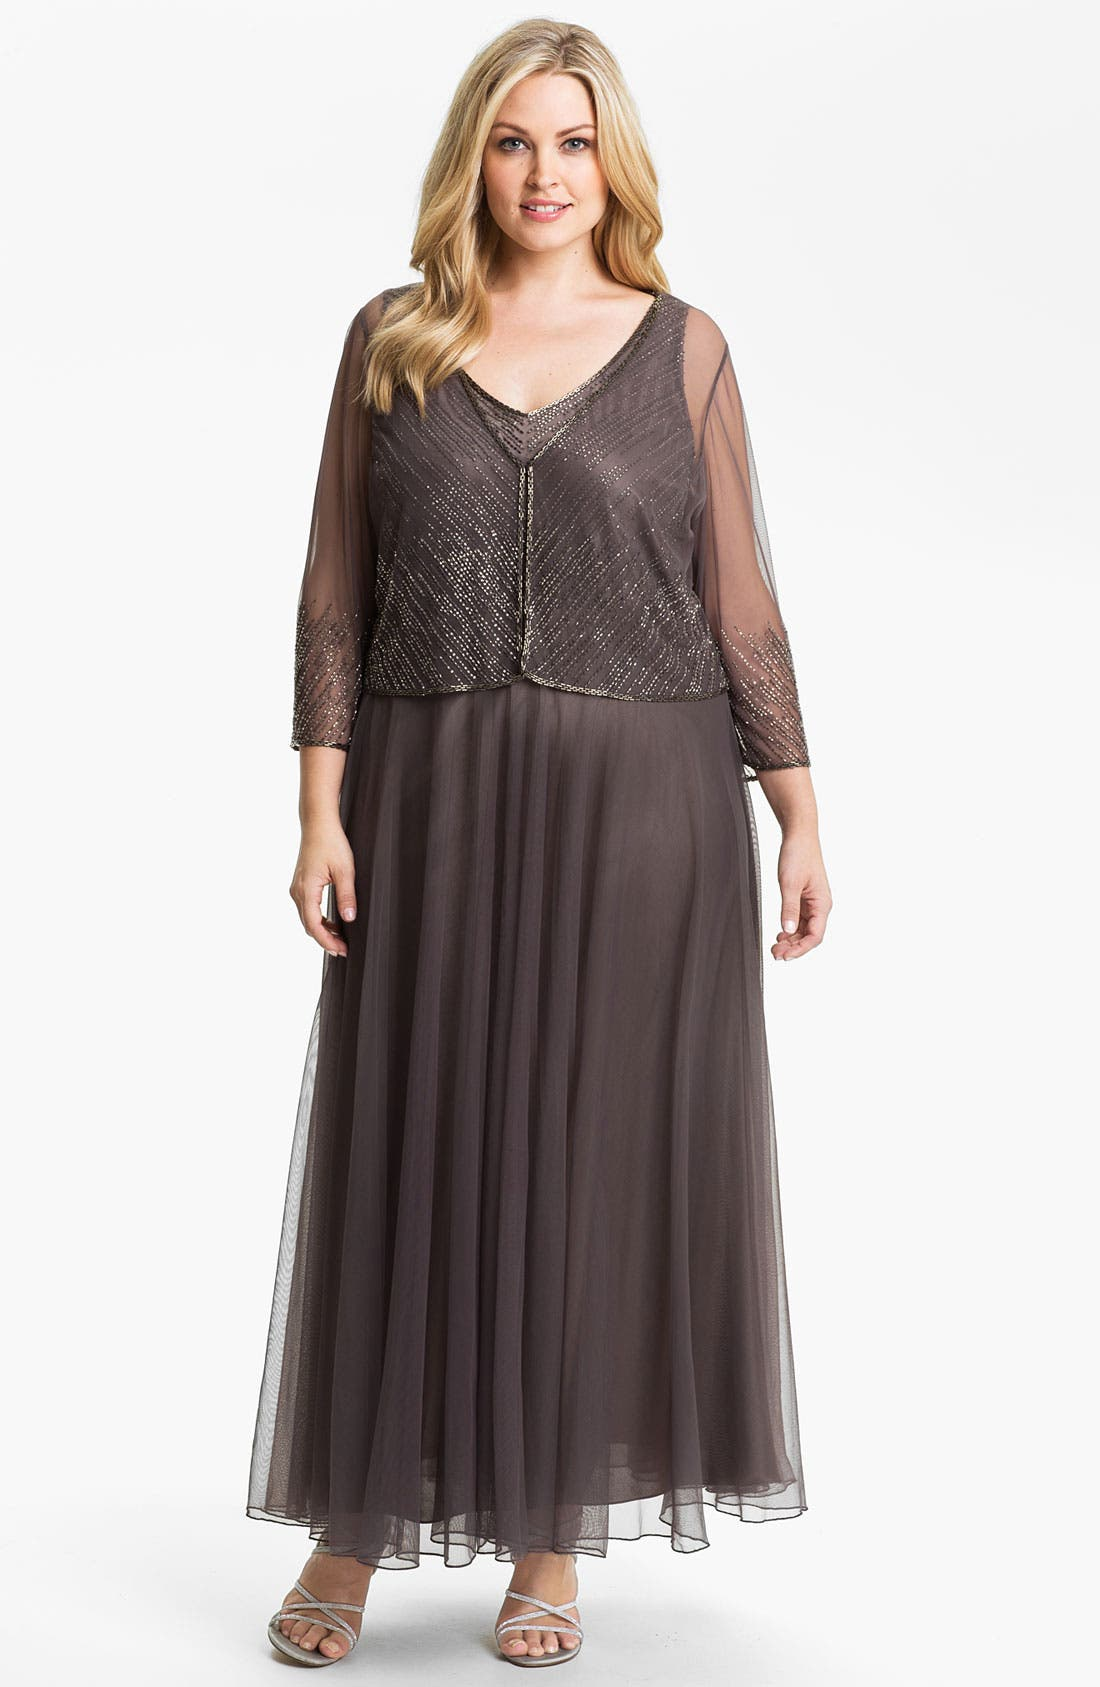 Alternate Image 1 Selected - J Kara Beaded Chiffon Dress & Jacket (Plus)